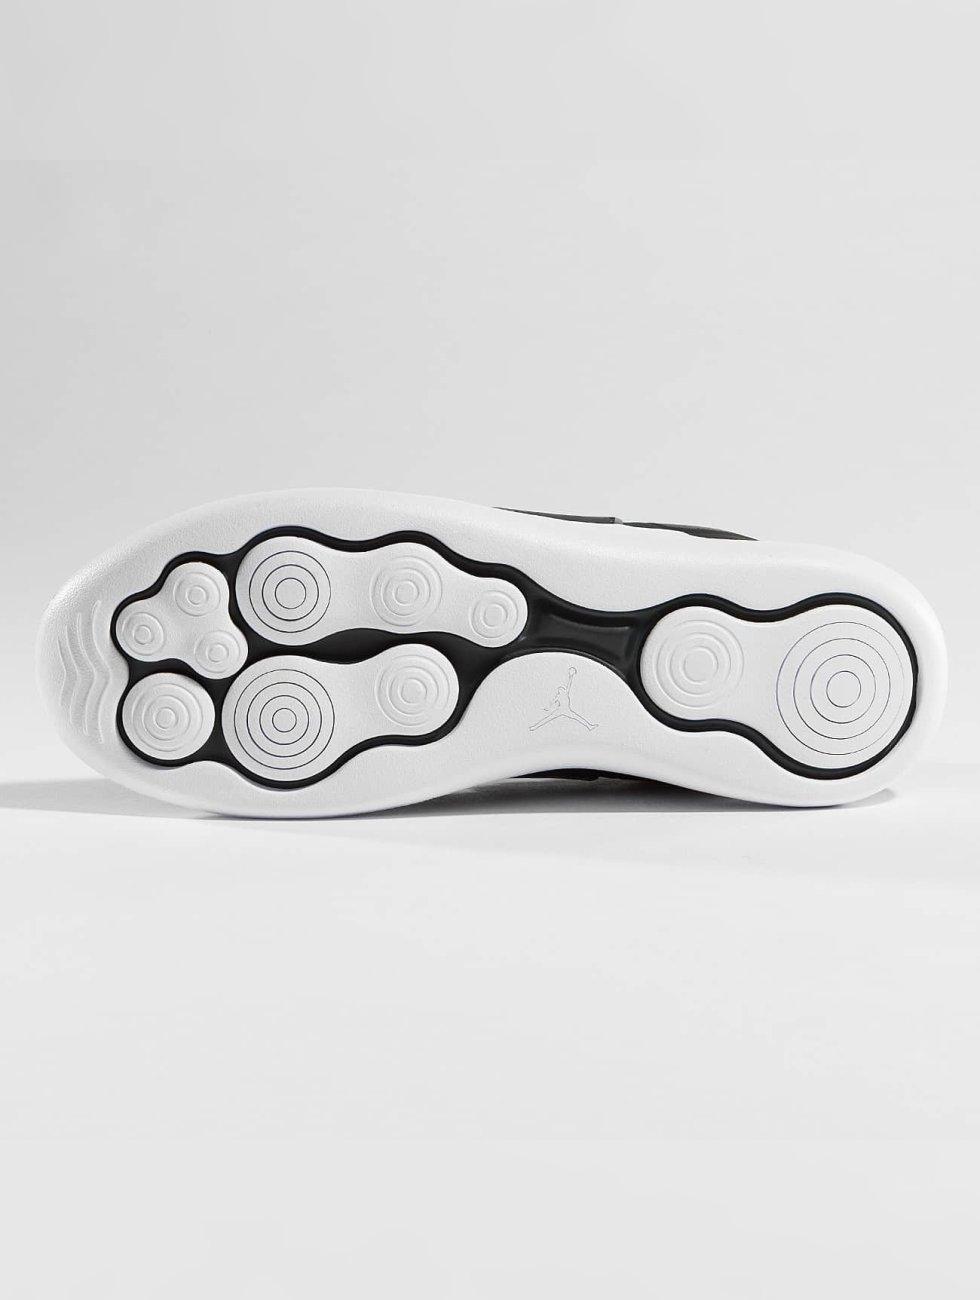 Jordan Scarpa / Sneaker Formazione Lunare Di Ghiaia In Nero 407 109 FSAIWZLn